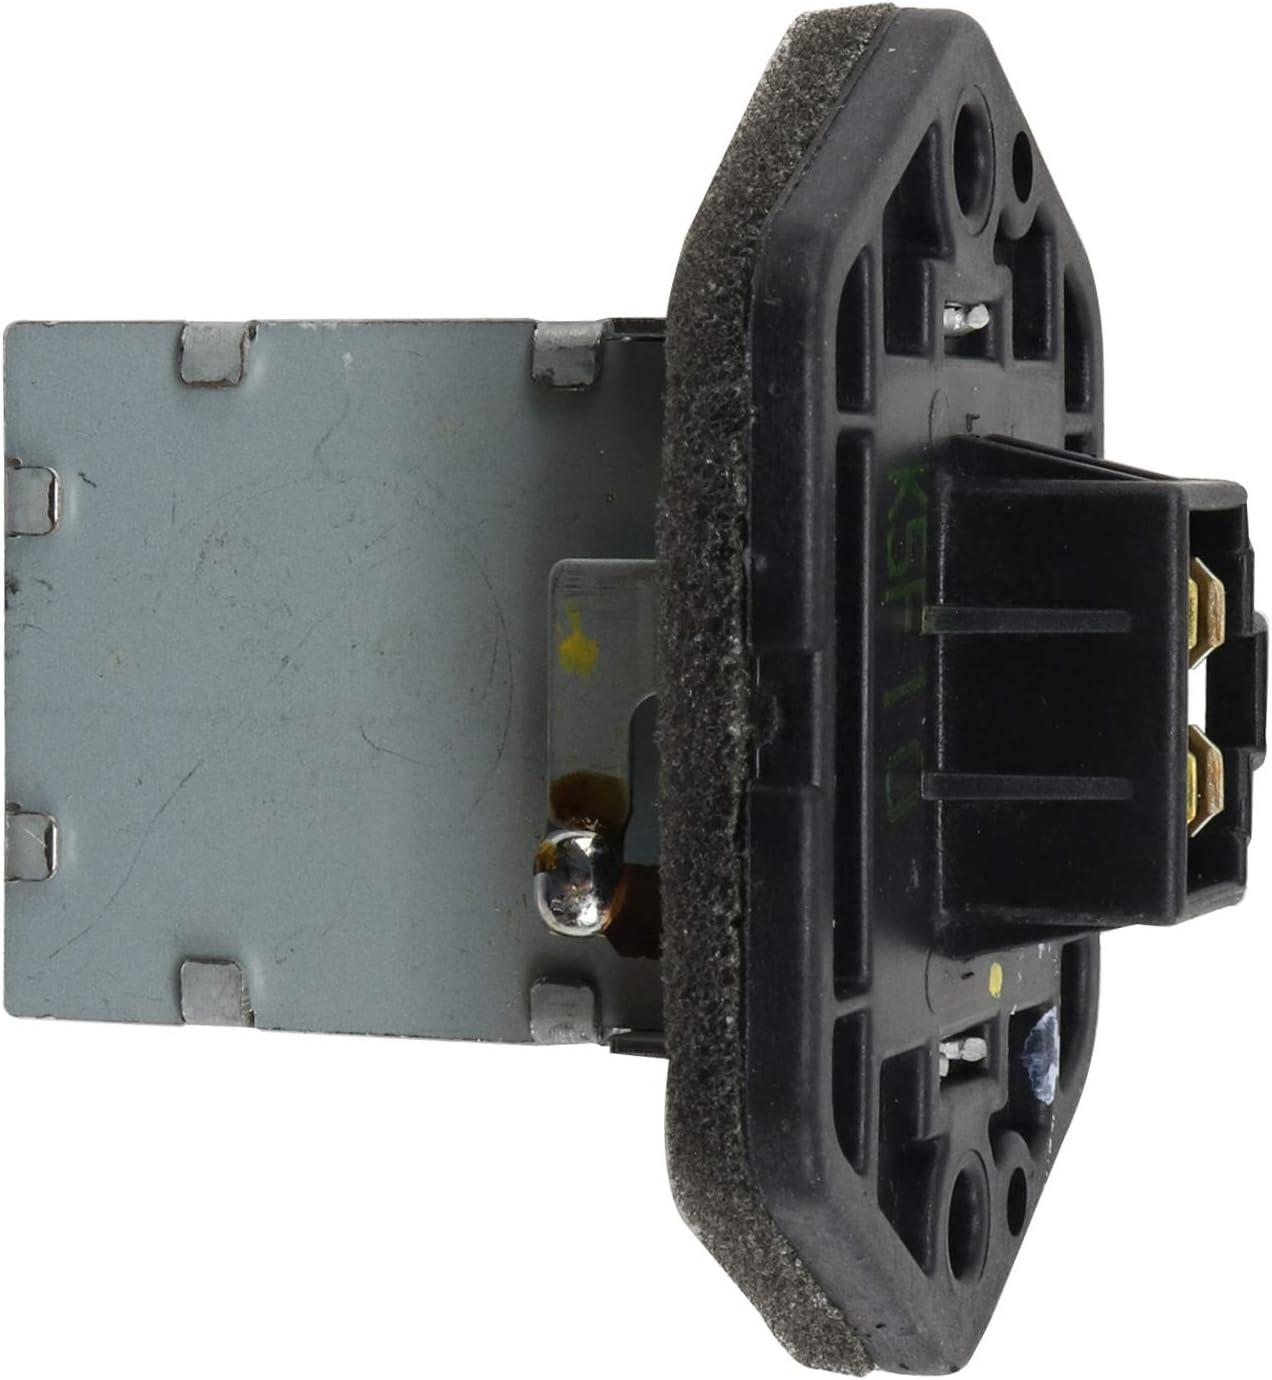 BECKARNLEY 204-0035 Blower Motor Resistor